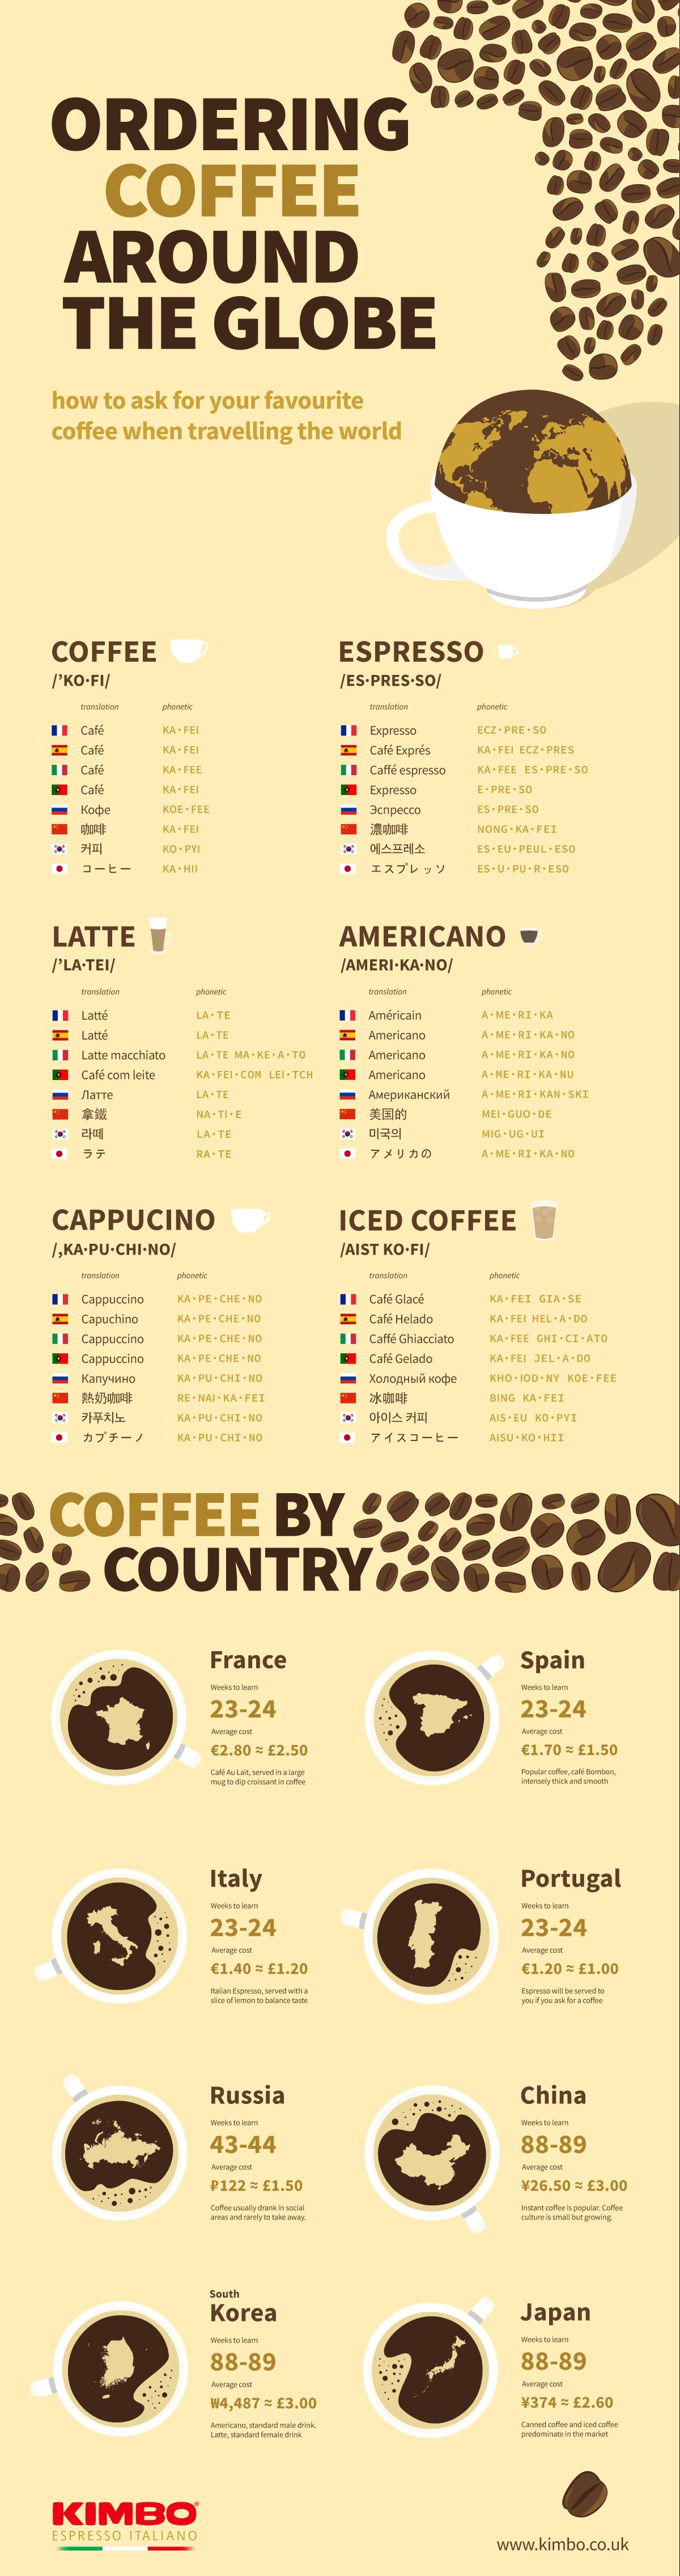 Ordering coffee around the globe